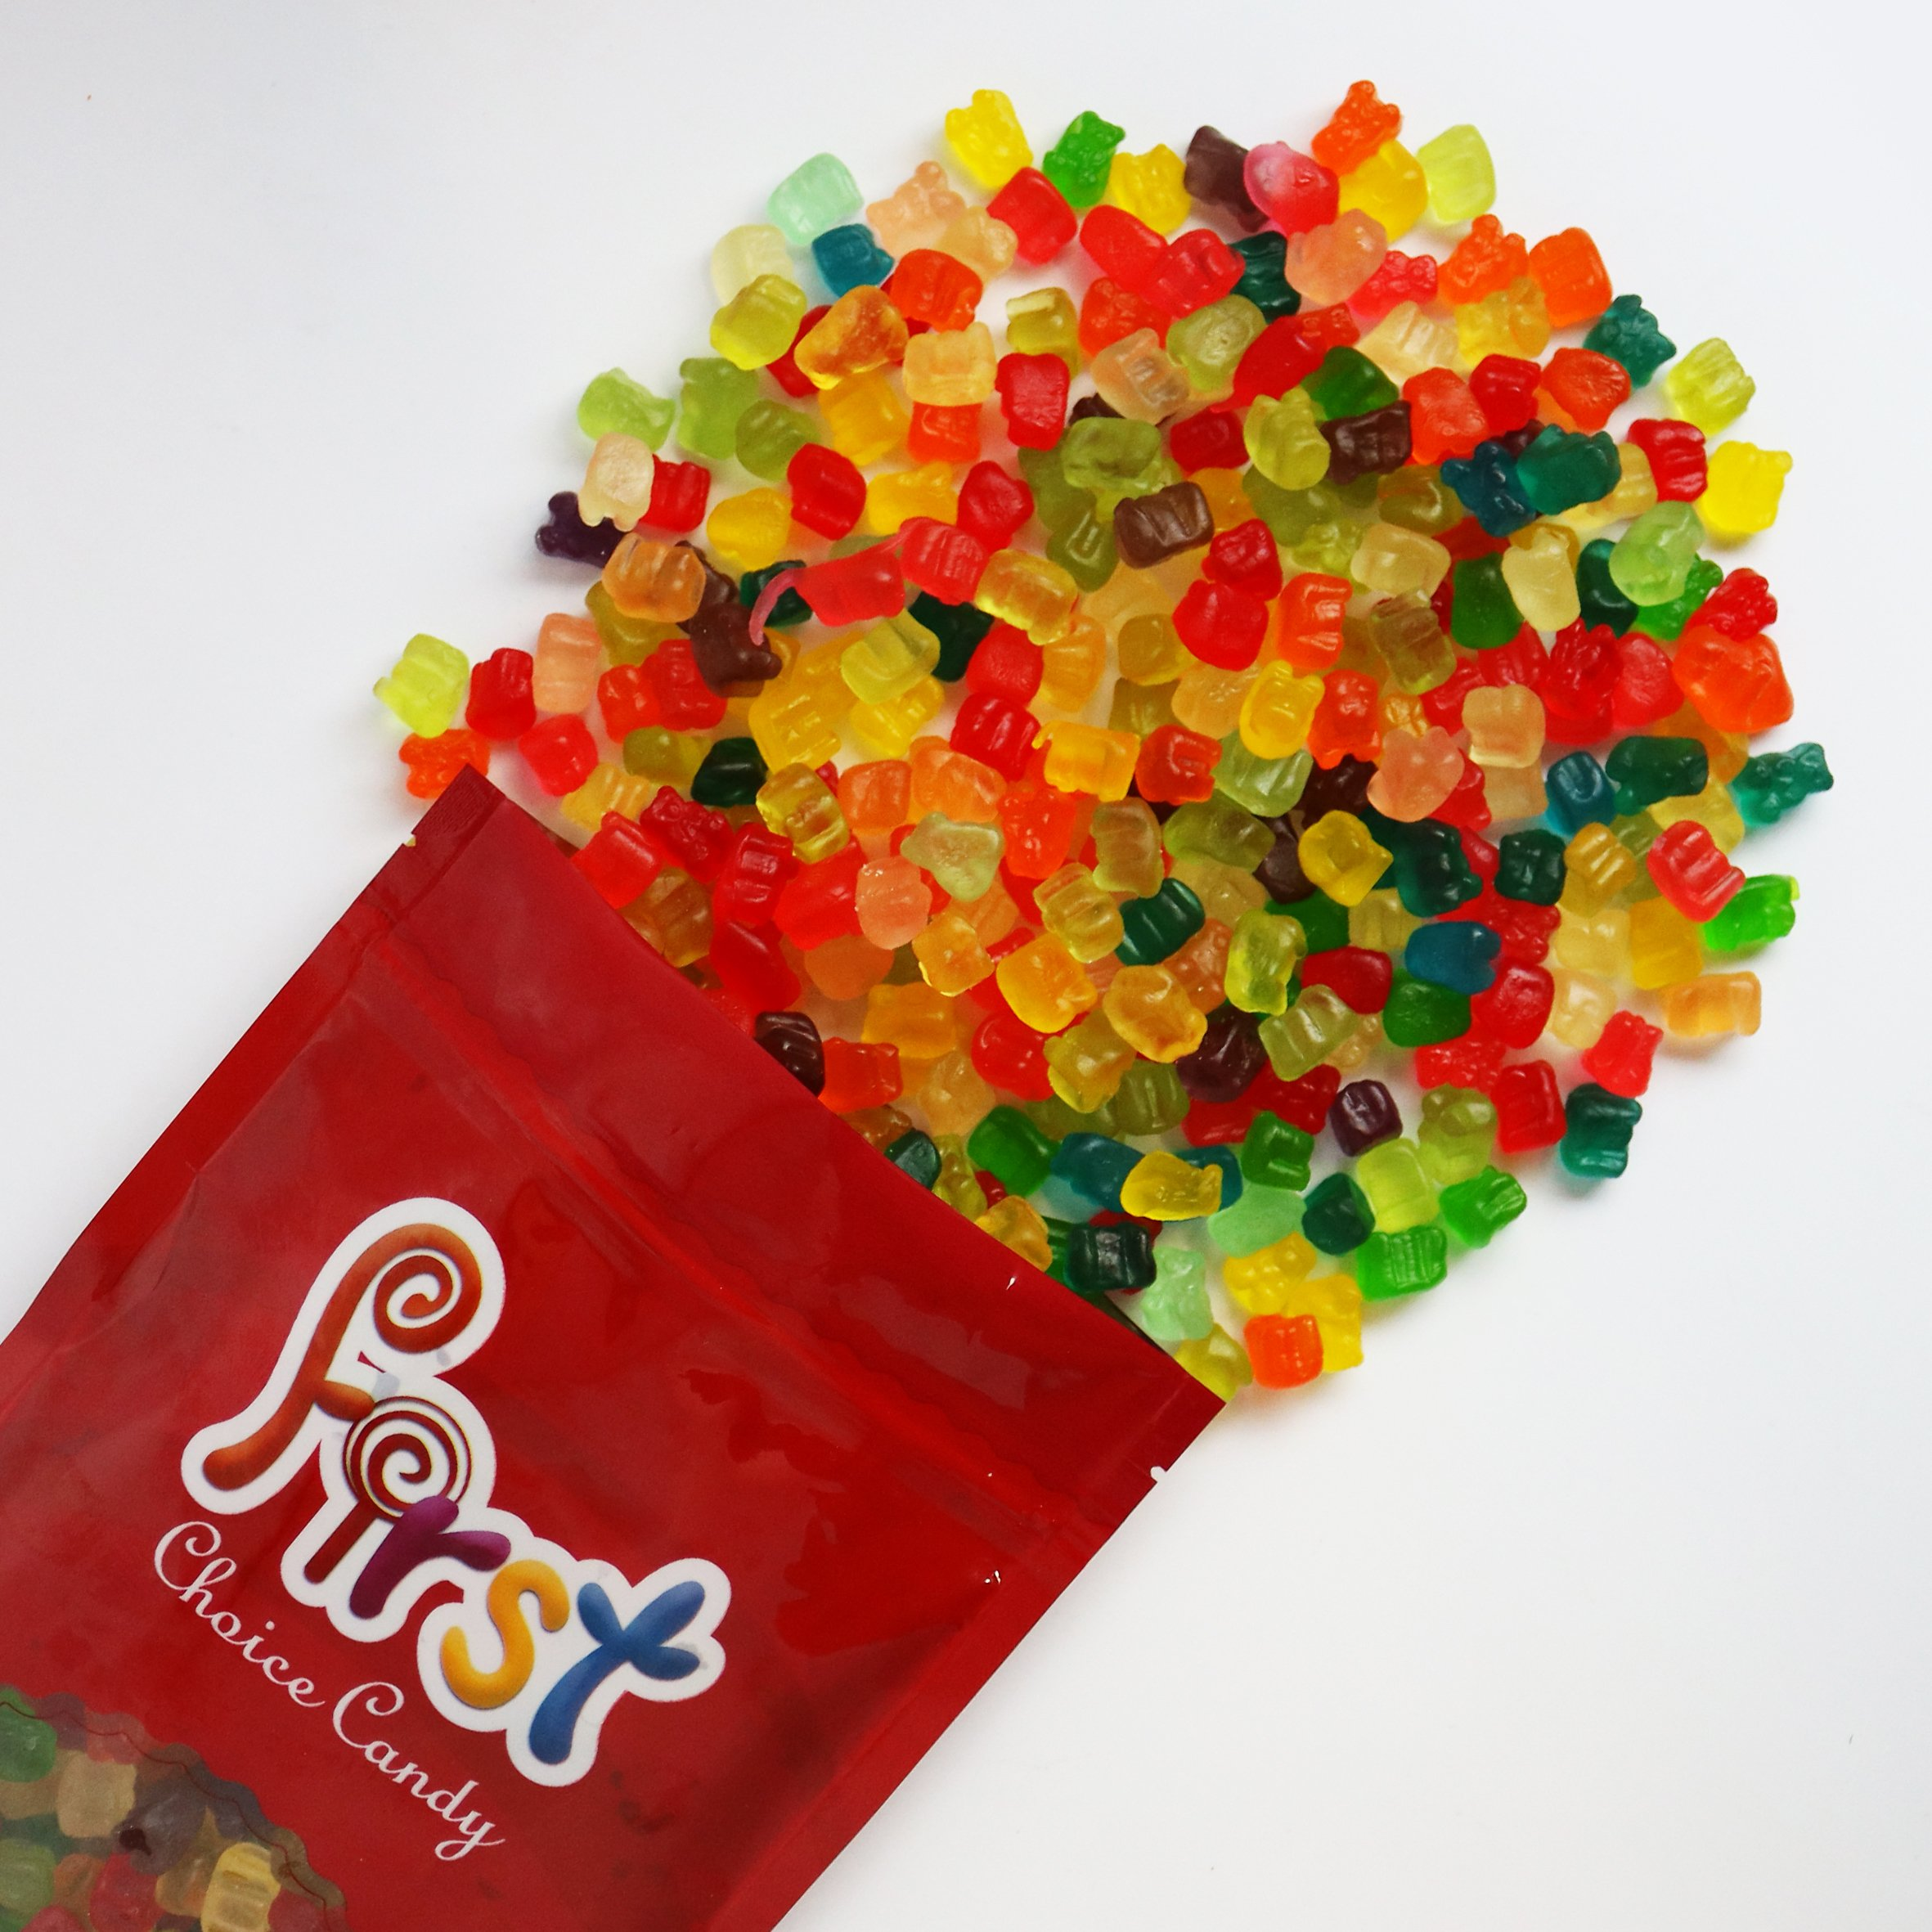 FirstChoiceCandy Albanese Mini Gummi Bears 2 Pound Resealable Bag